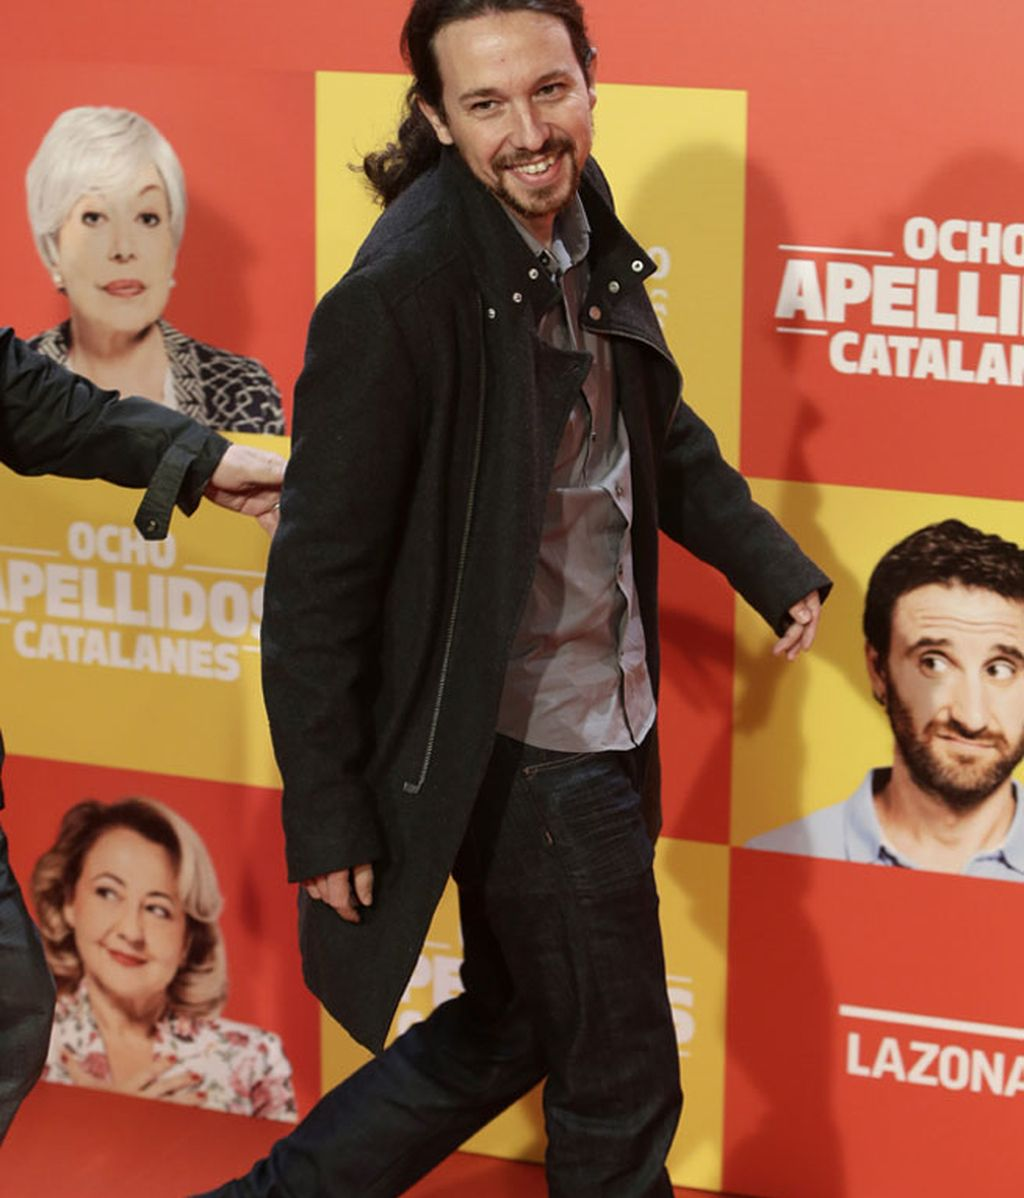 Pablo Iglesias (Podemos), su primera vez en un photocall